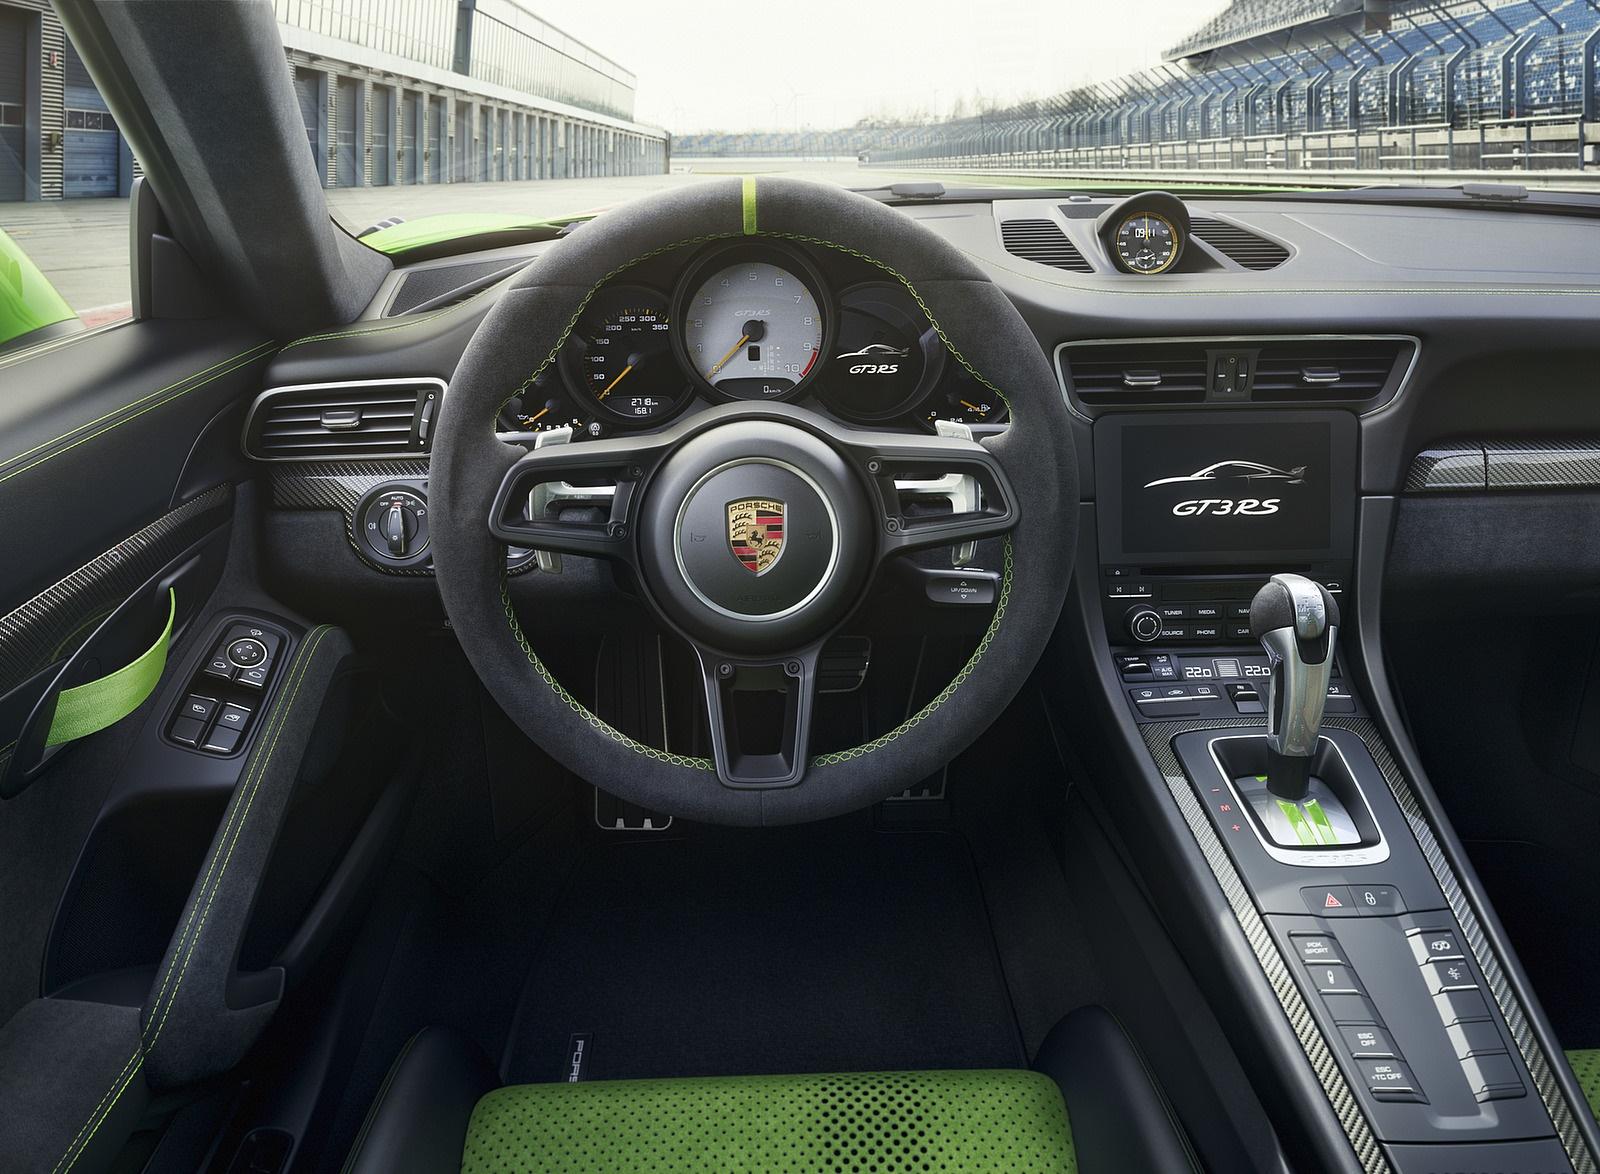 2019 Porsche 911 GT3 RS Interior Cockpit Wallpaper